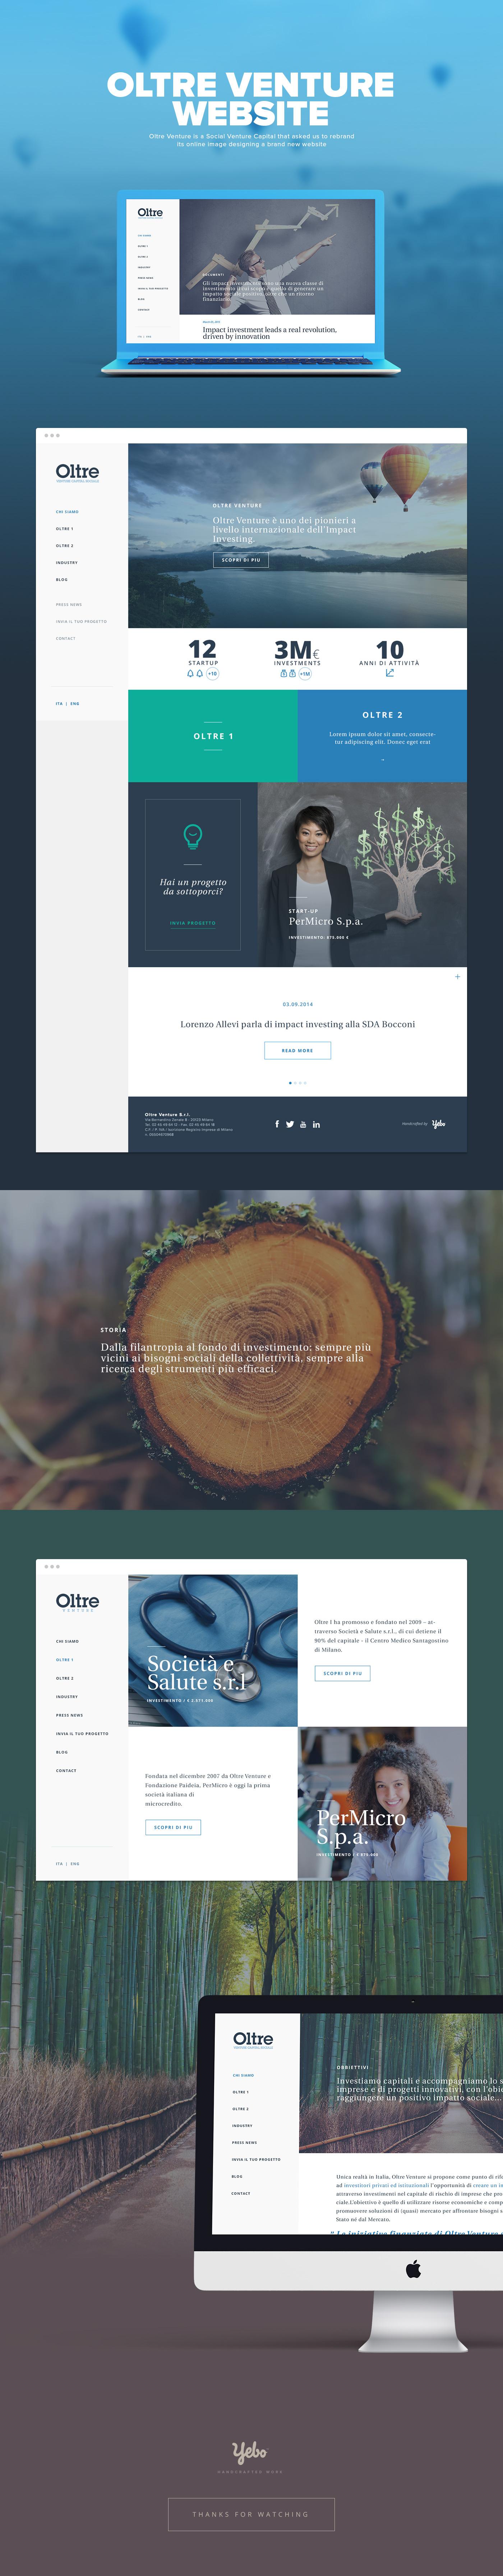 Oltre Venture Website